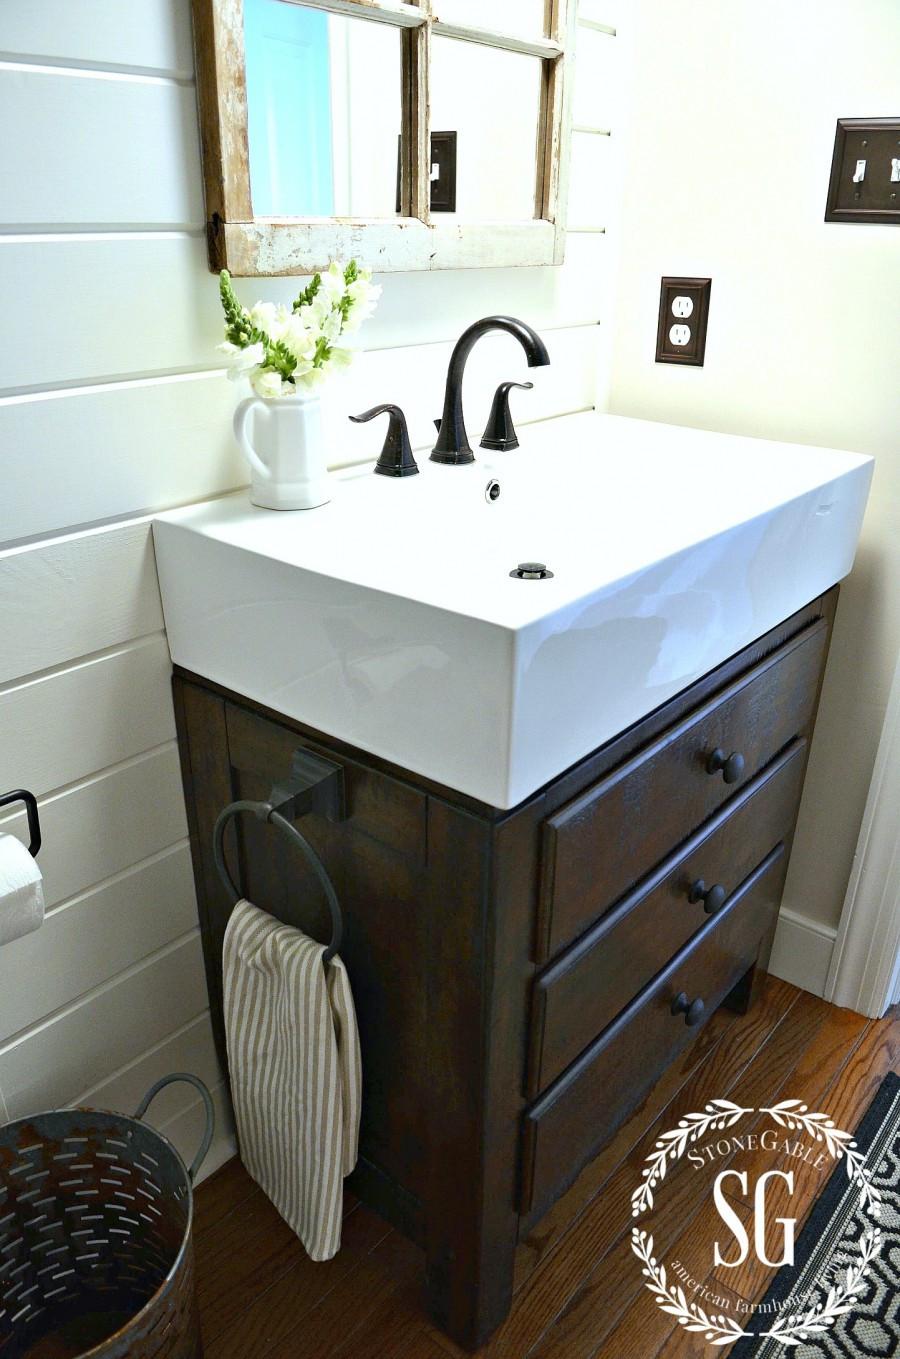 Best ideas about Farmhouse Bathroom Sink . Save or Pin FARMHOUSE POWDER ROOM REVEAL StoneGable Now.